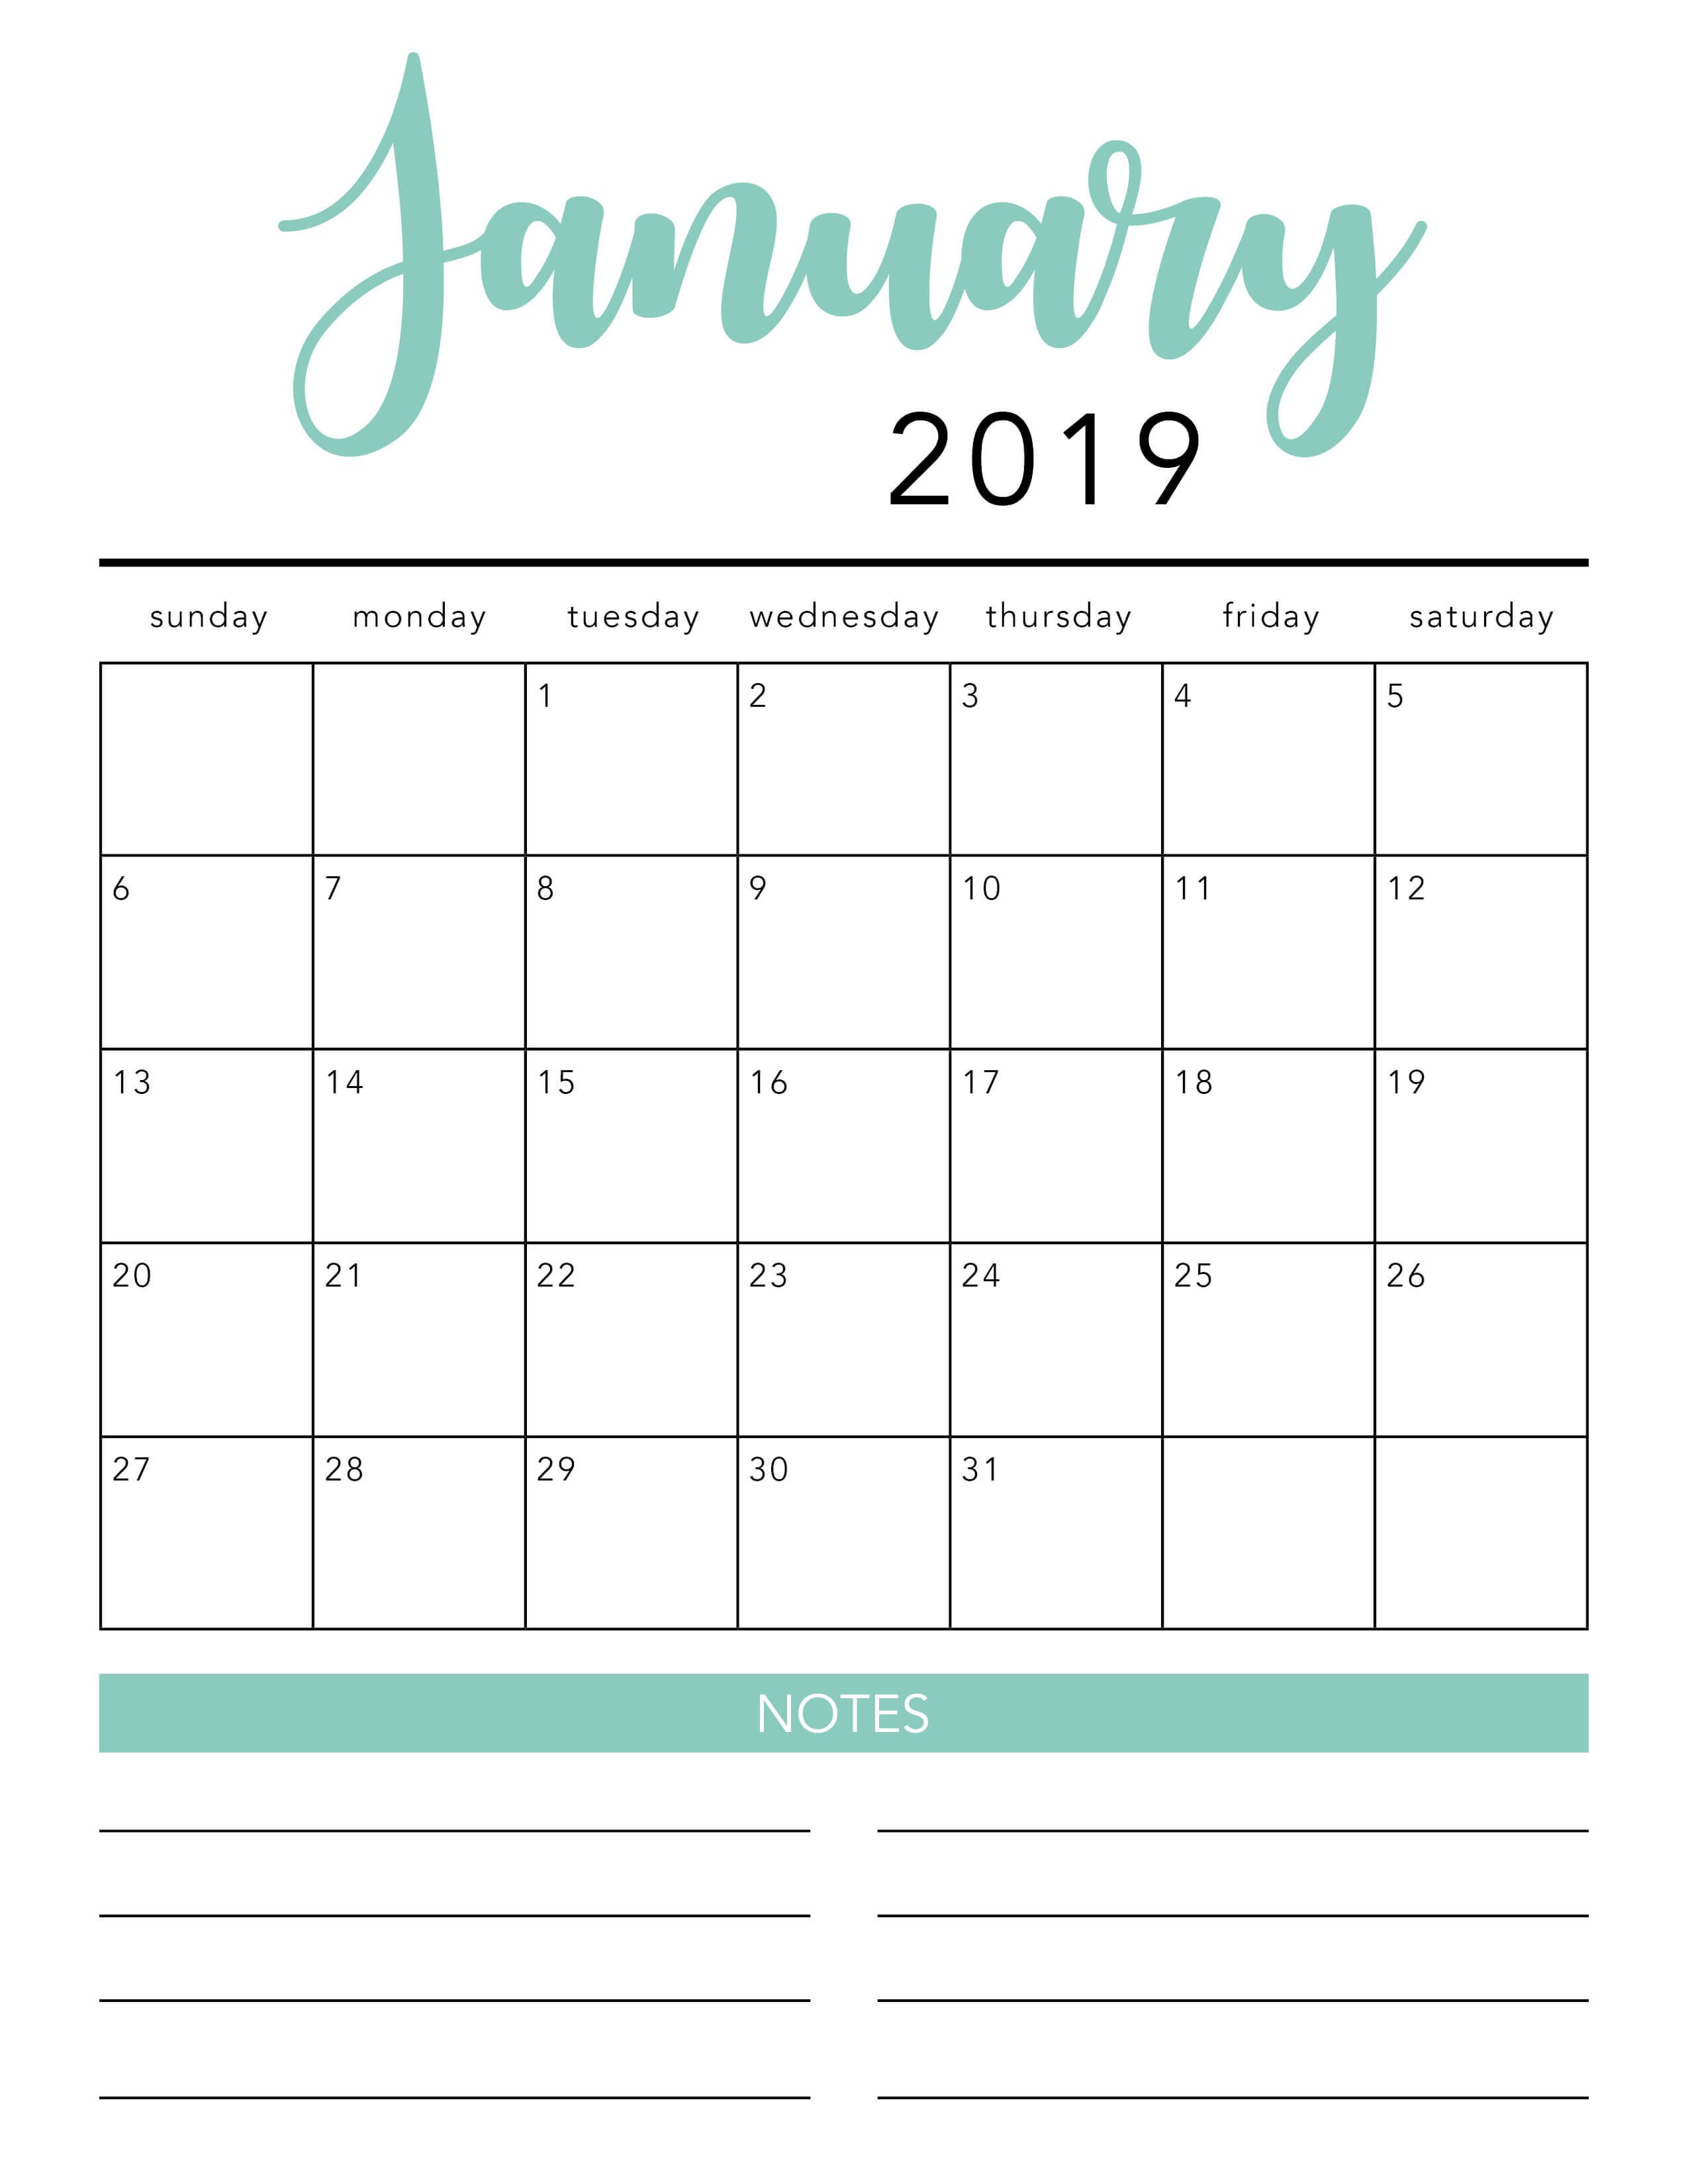 Free 2019 Printable Calendar Template (2 Colors!) - I Heart Naptime within Free Printable Calendar Templates 8 X 10